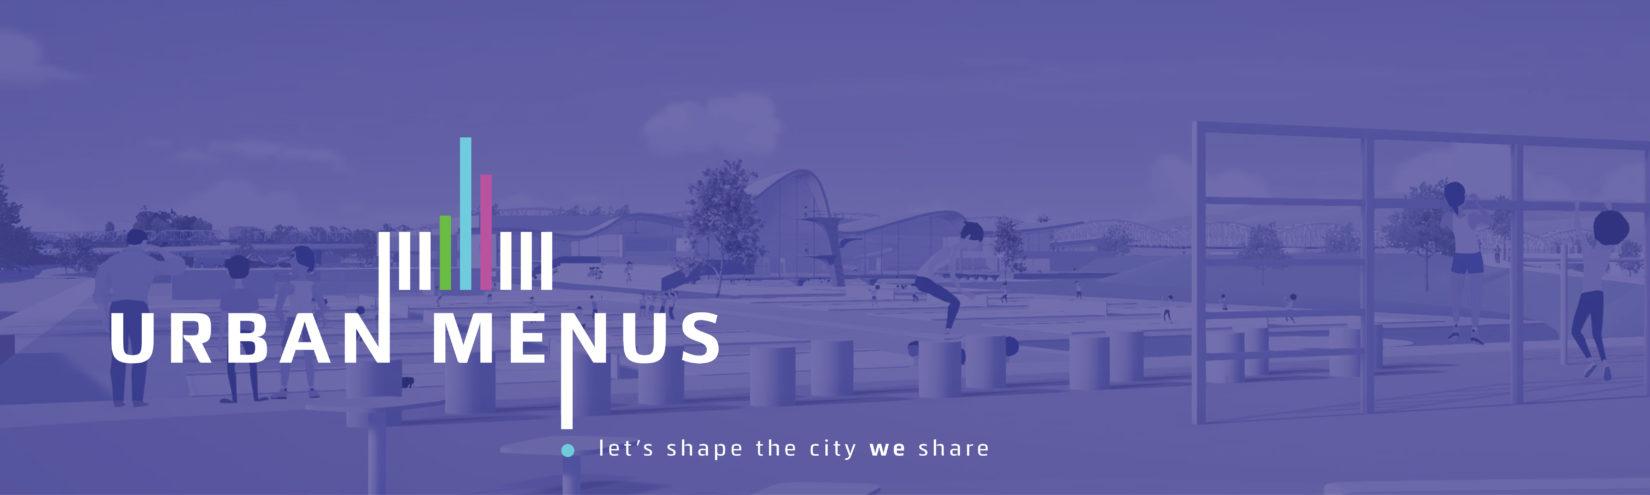 Banner-Urban-Menus-01